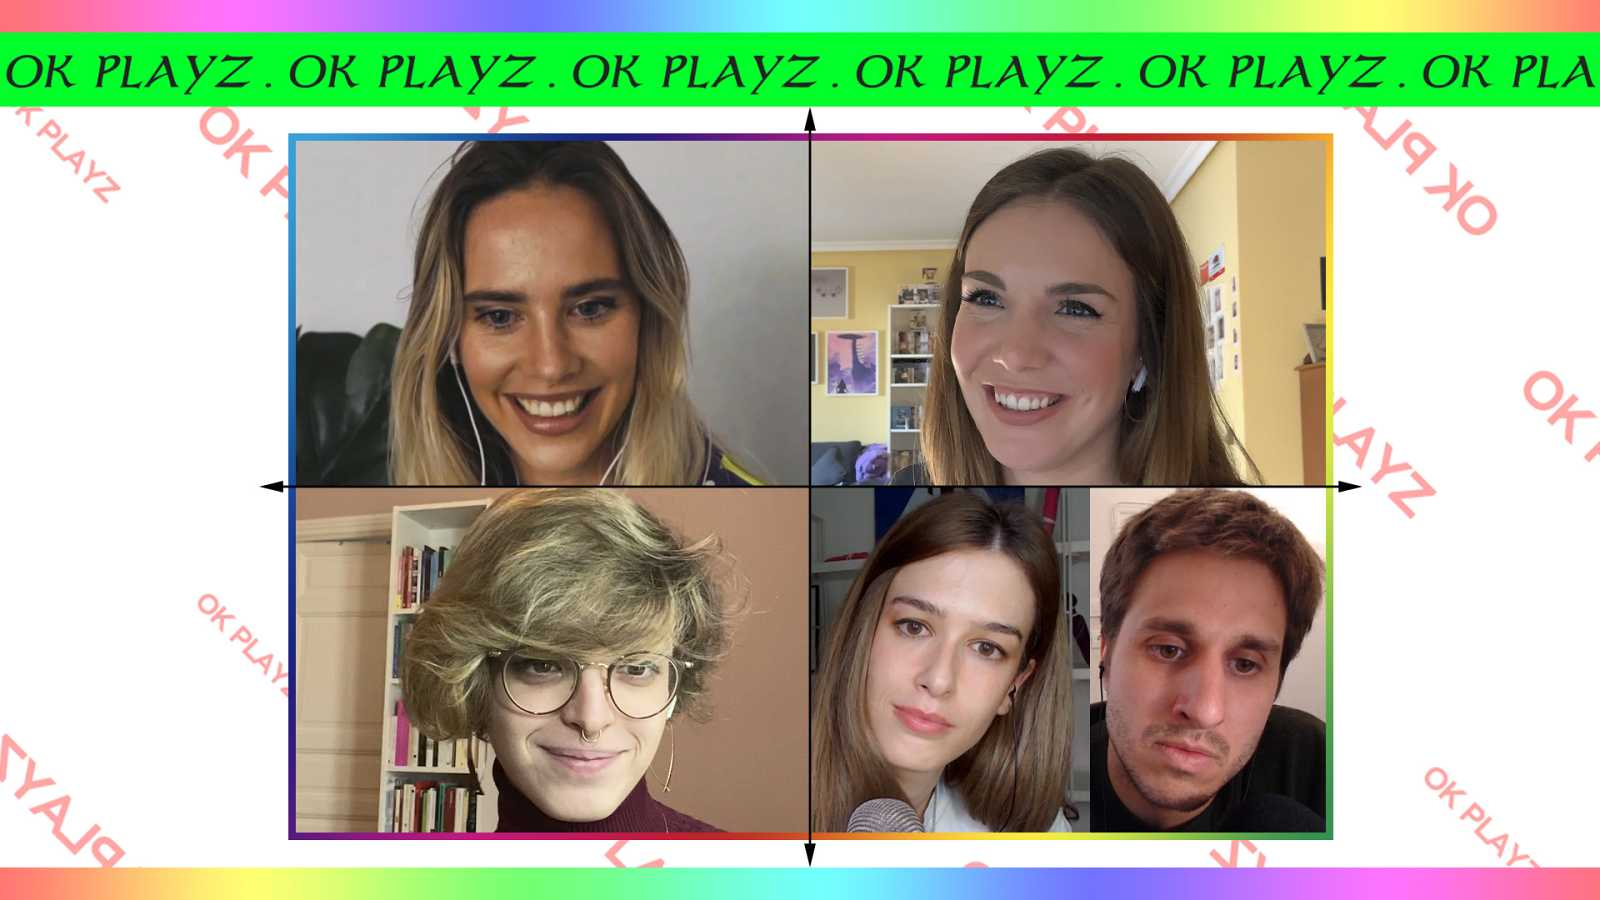 OK Playz - OK Playz con Brisa Fenoy, Inés Hernand y Elizabeth Duval